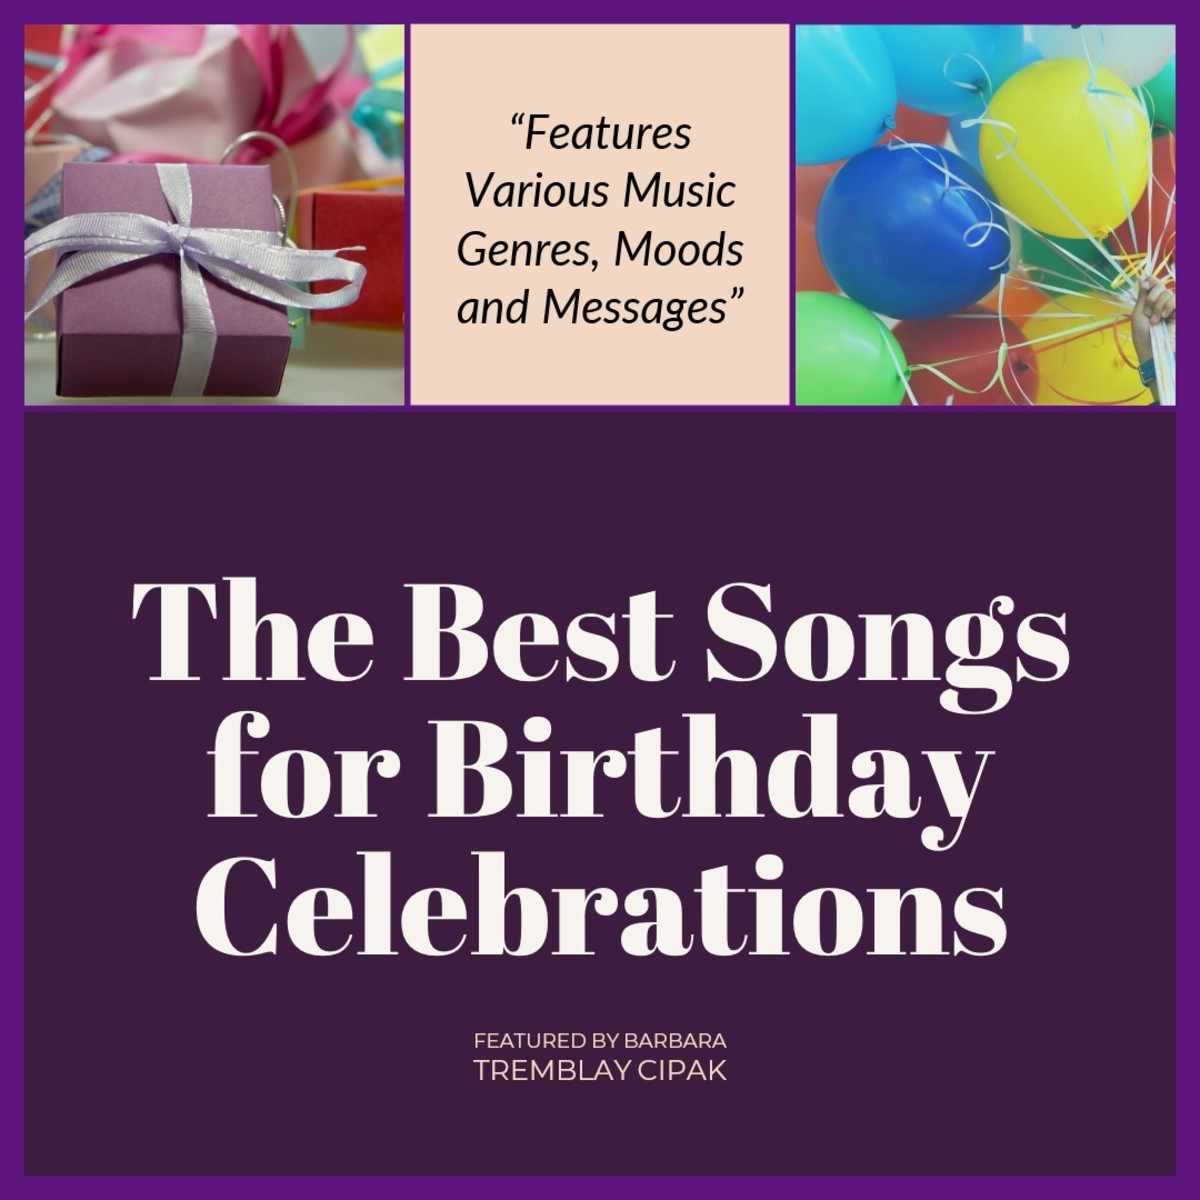 The Best Songs for Birthdays